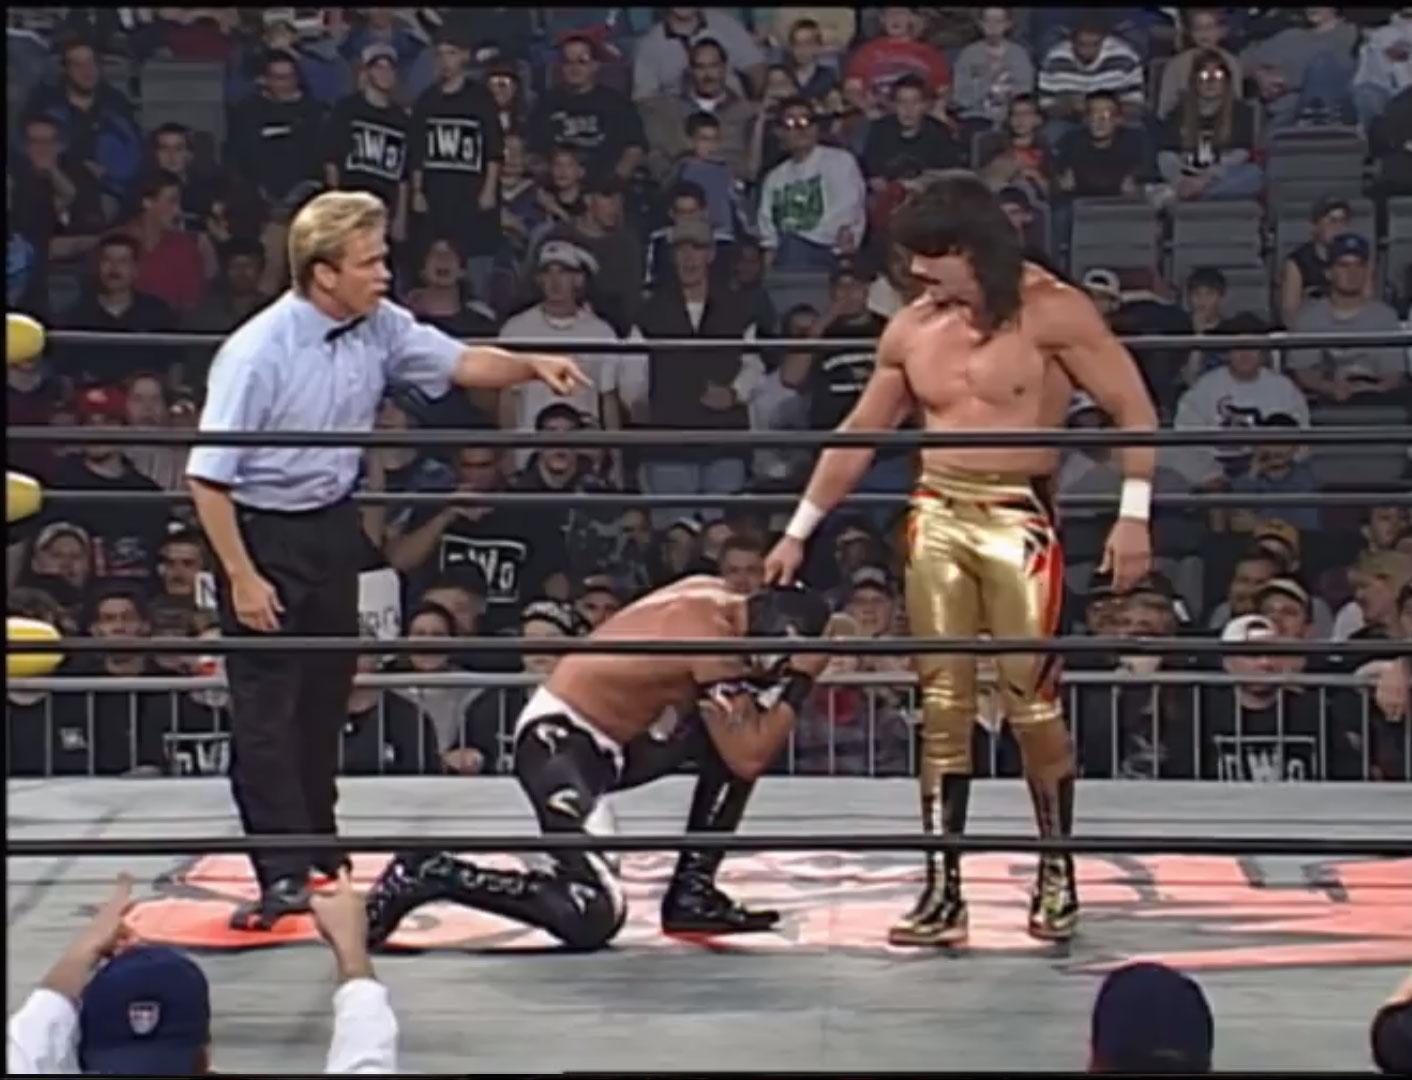 Eddy Guerrero vs. Rey Misterio, Jr.  WCW Cruiserweight Championship WCW World War 3, Nov 23rd 1997